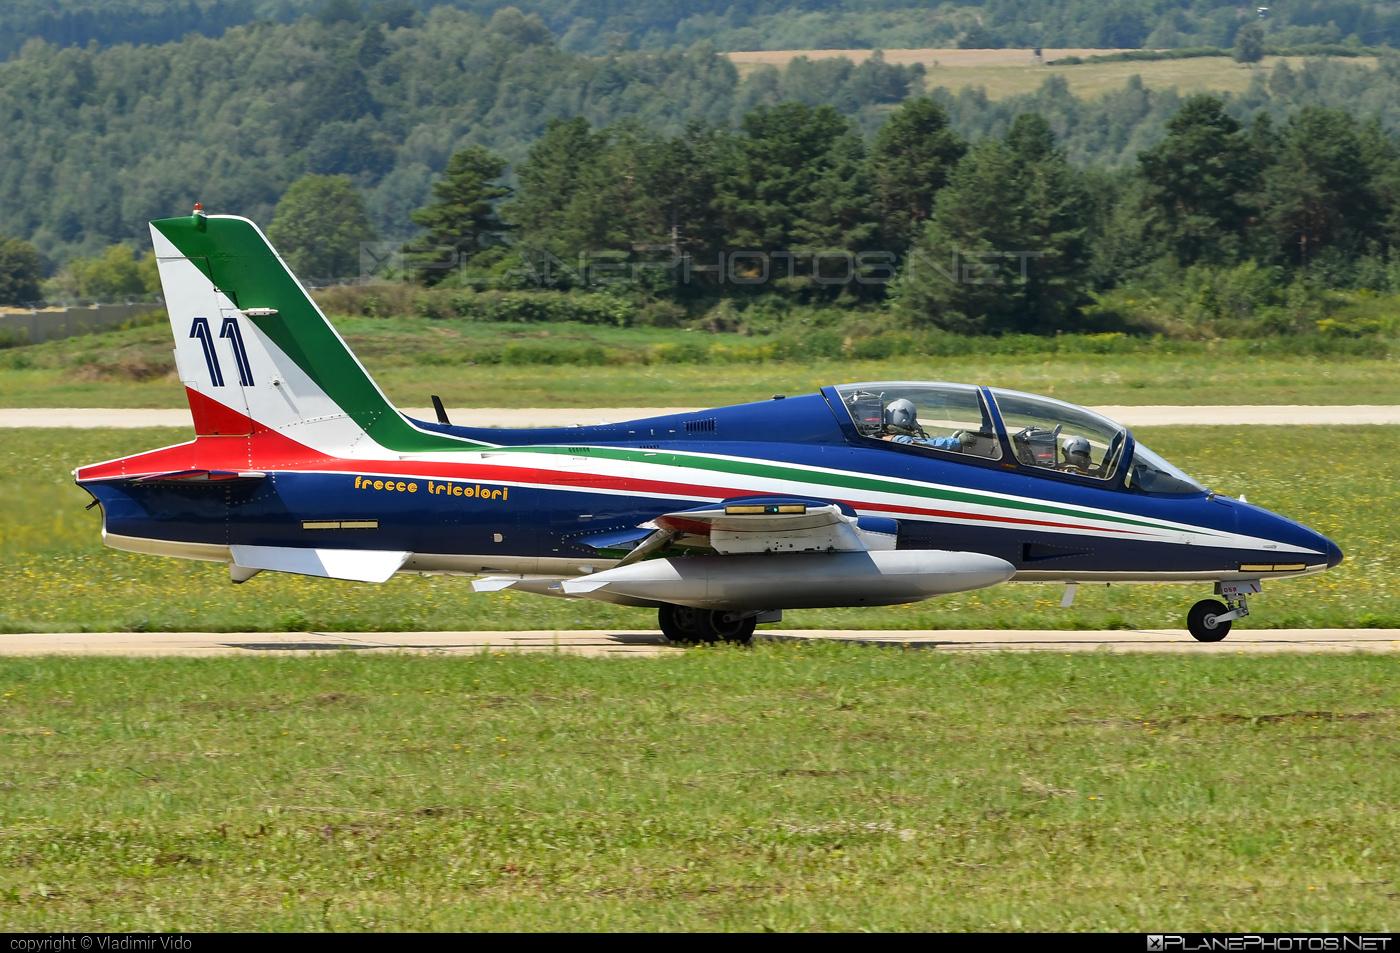 Aermacchi MB-339-A/PAN - MM55052 operated by Aeronautica Militare (Italian Air Force) #aermacchi #aermacchi339 #aermacchimb339 #aermacchimb339apan #mb339 #mb339apan #siaf2019